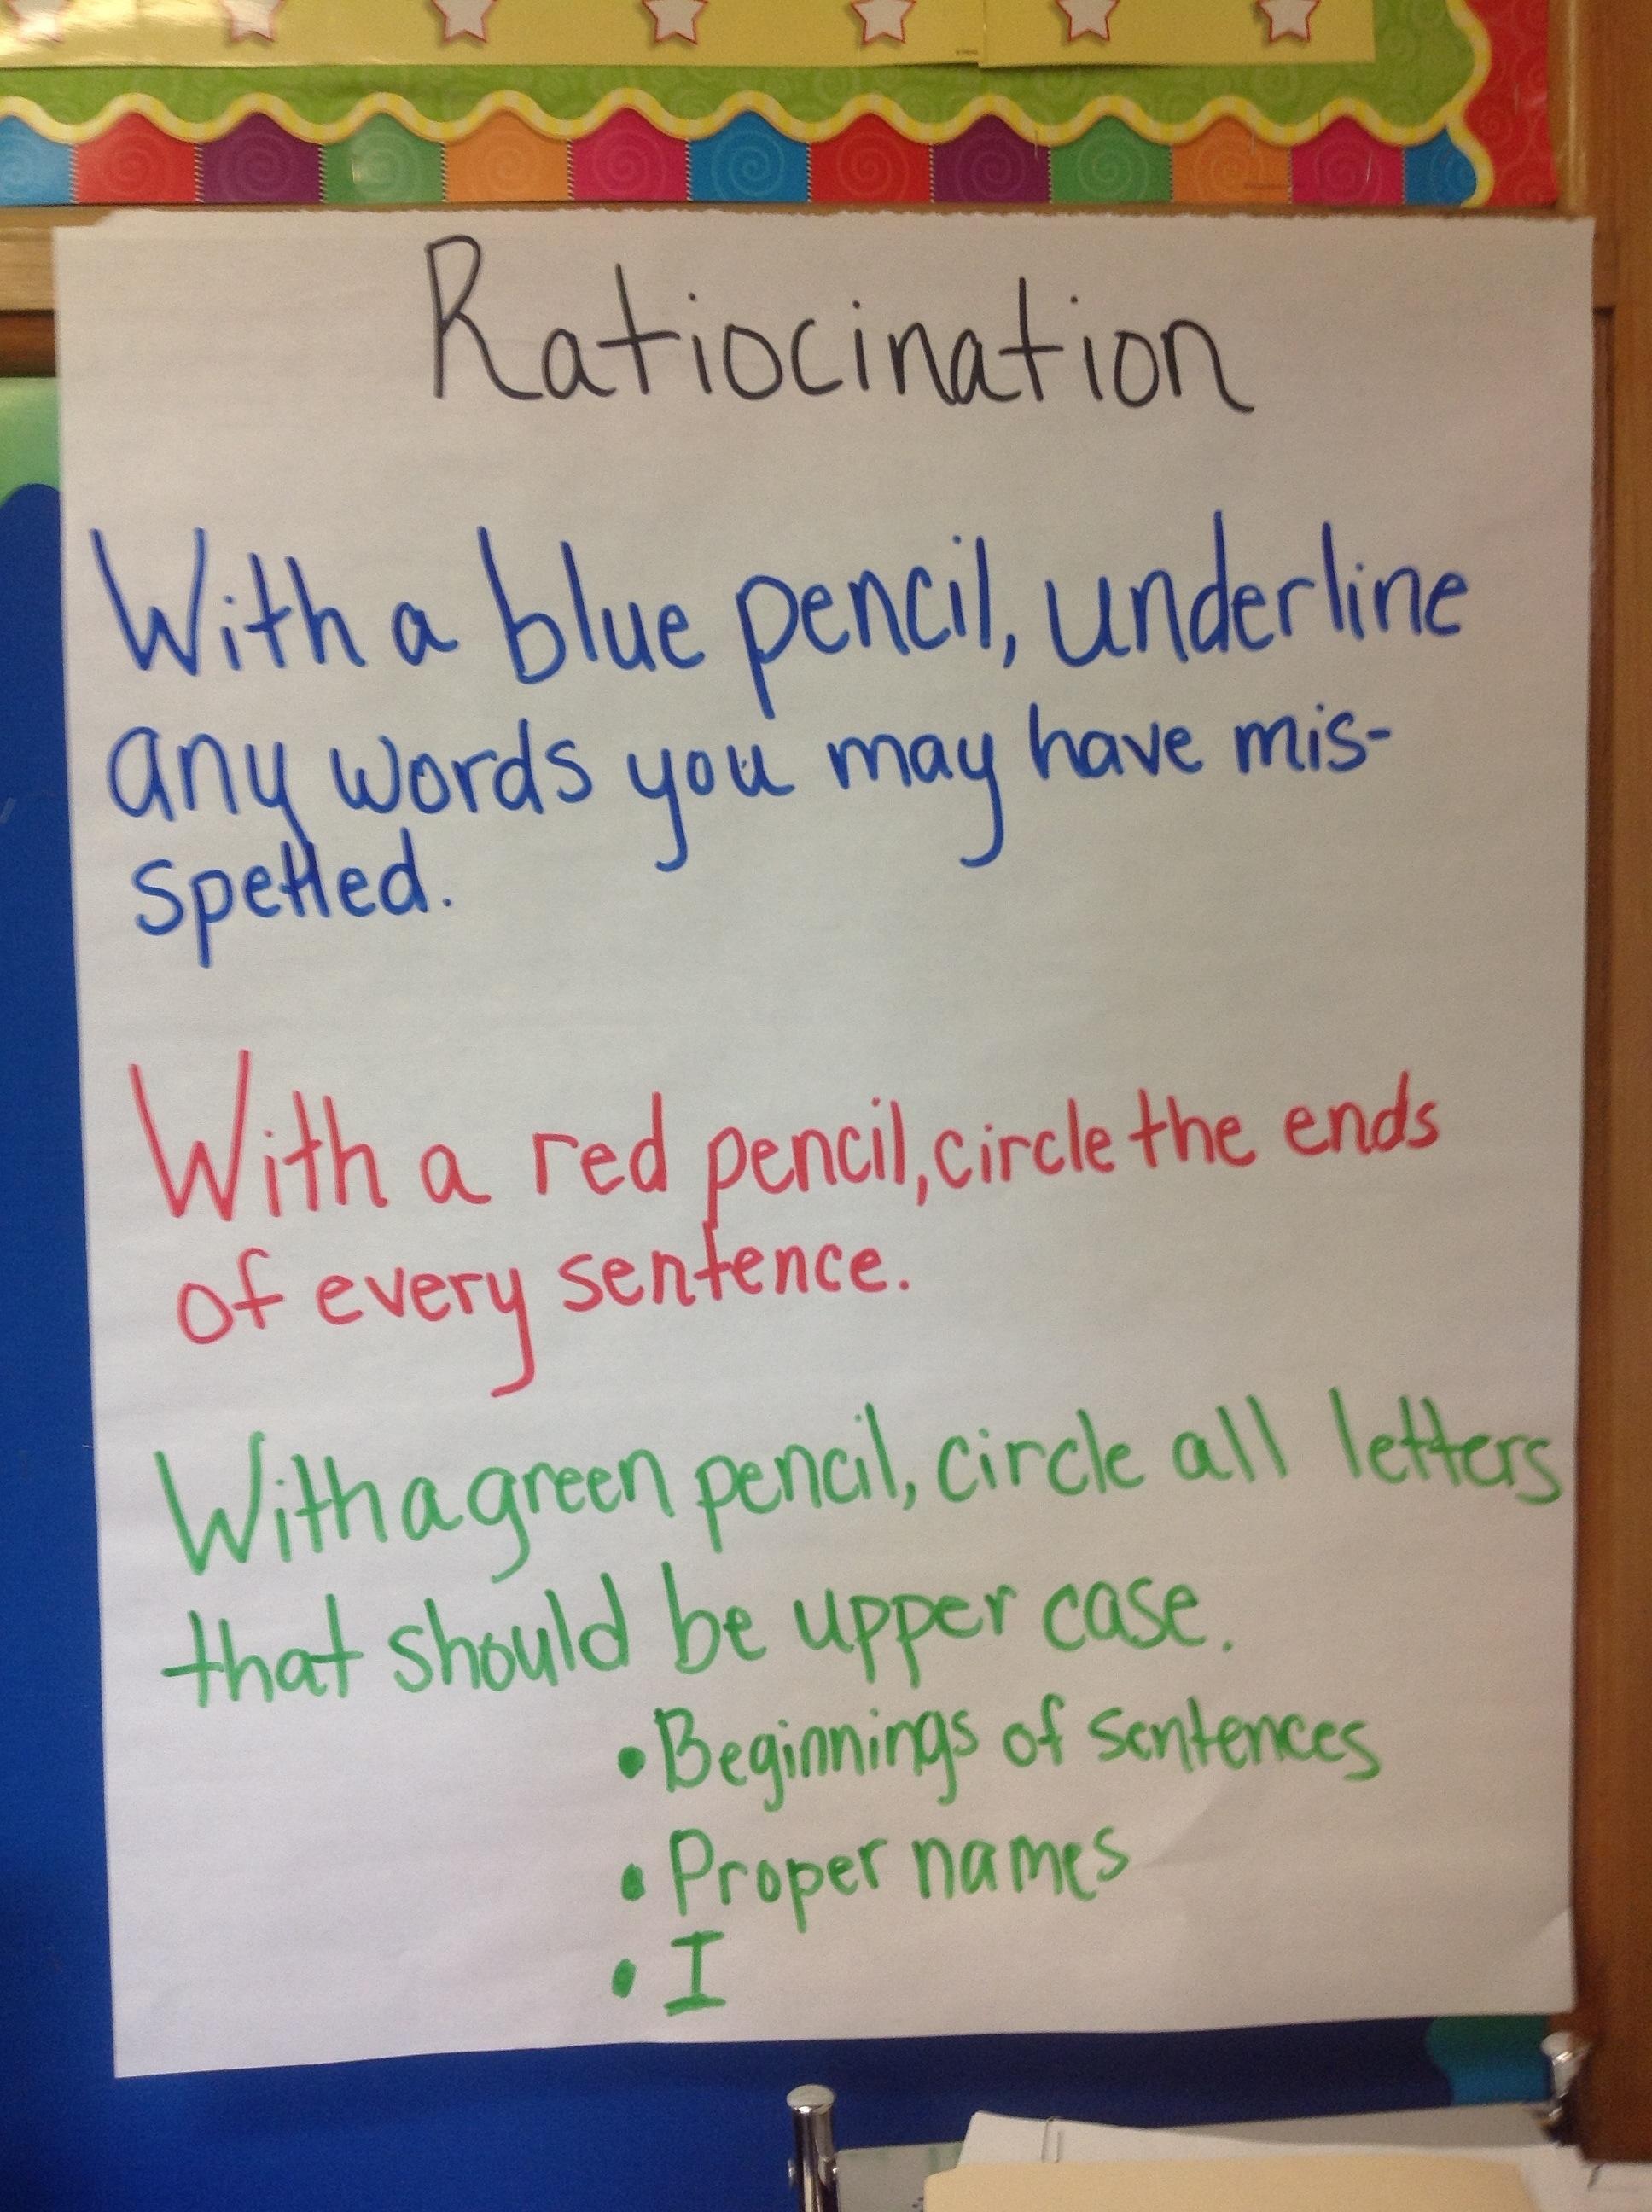 Ratiocination